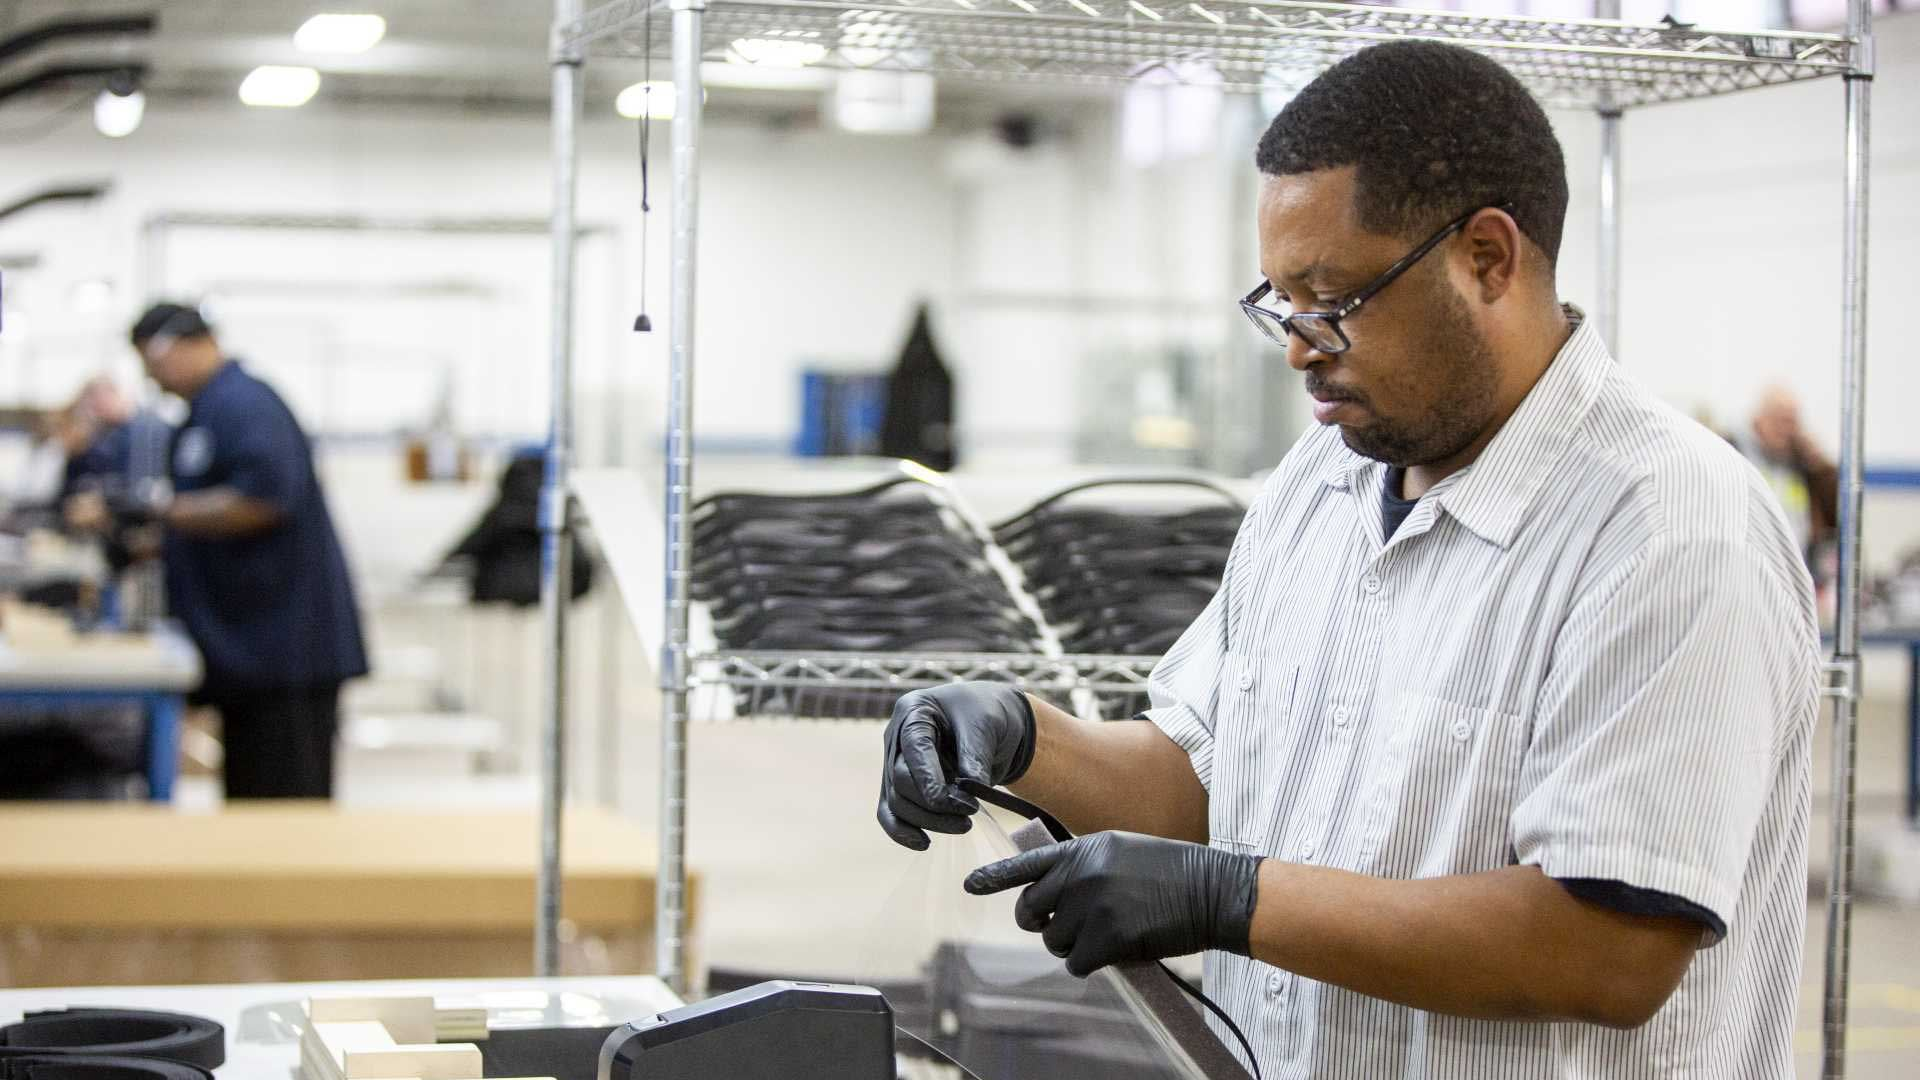 Ford se bude spolu s 3M, GE a UAW podílet na výrobě respirátorů a plicních ventilátorů | Ford se bude spolu s 3M, GE a UAW podílet na výrobě respirátorů a plicních ventilátorů